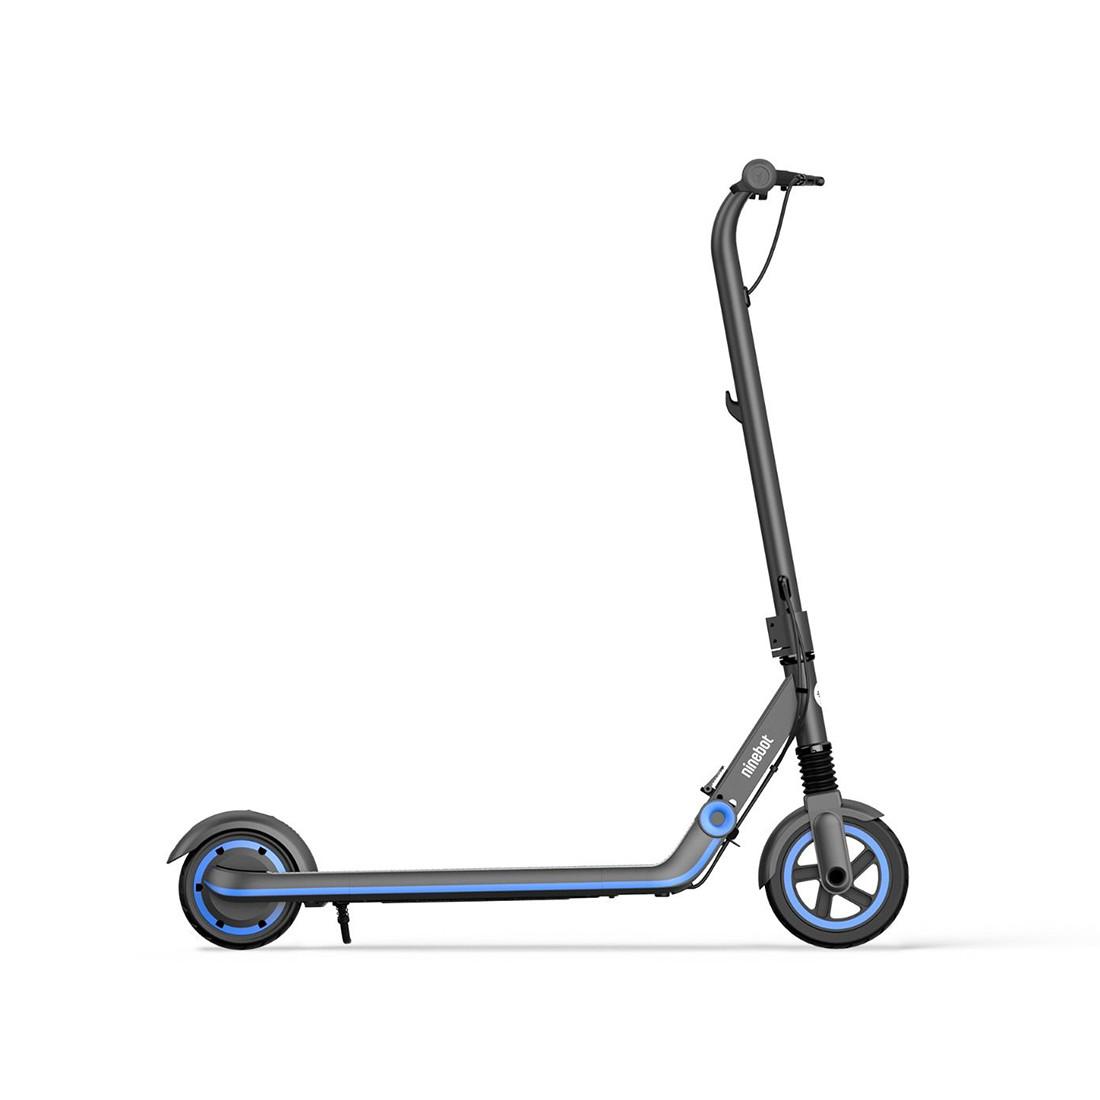 Электросамокат детский Ninebot KickScooter E10 Серый - фото 2